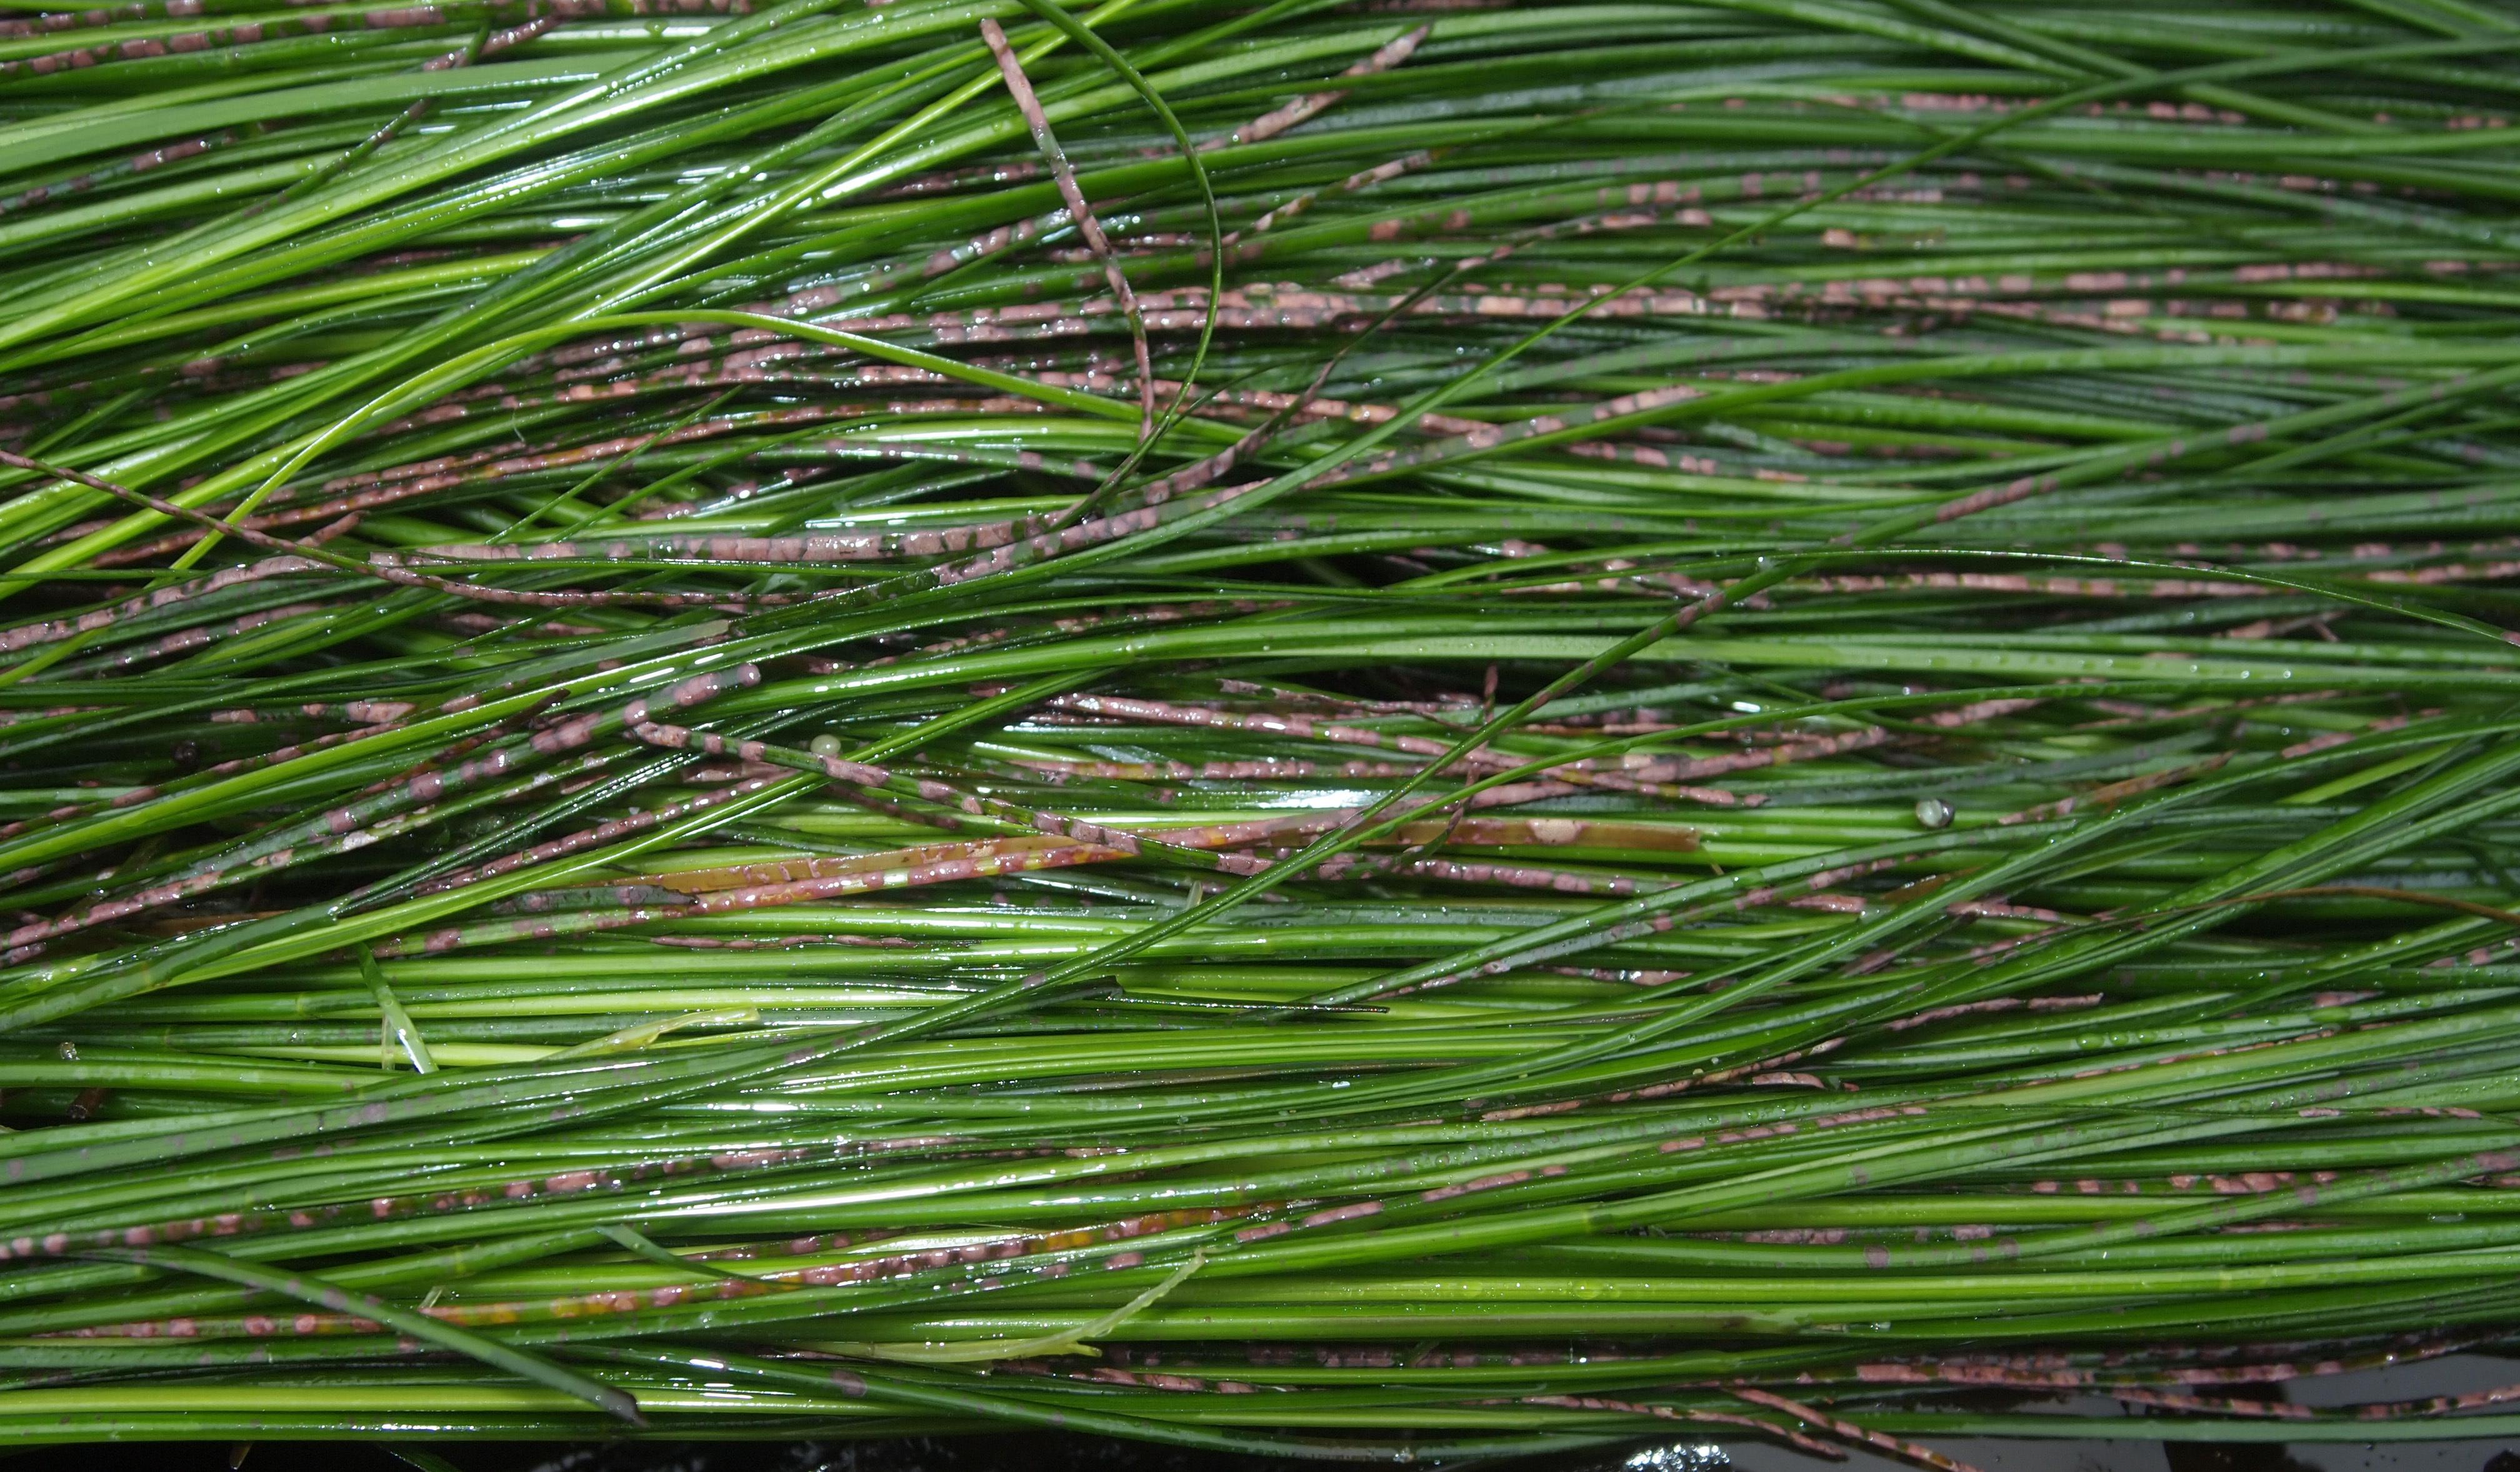 Image of <i>Melobesia marginata</i> Setchell & Foslie 1902